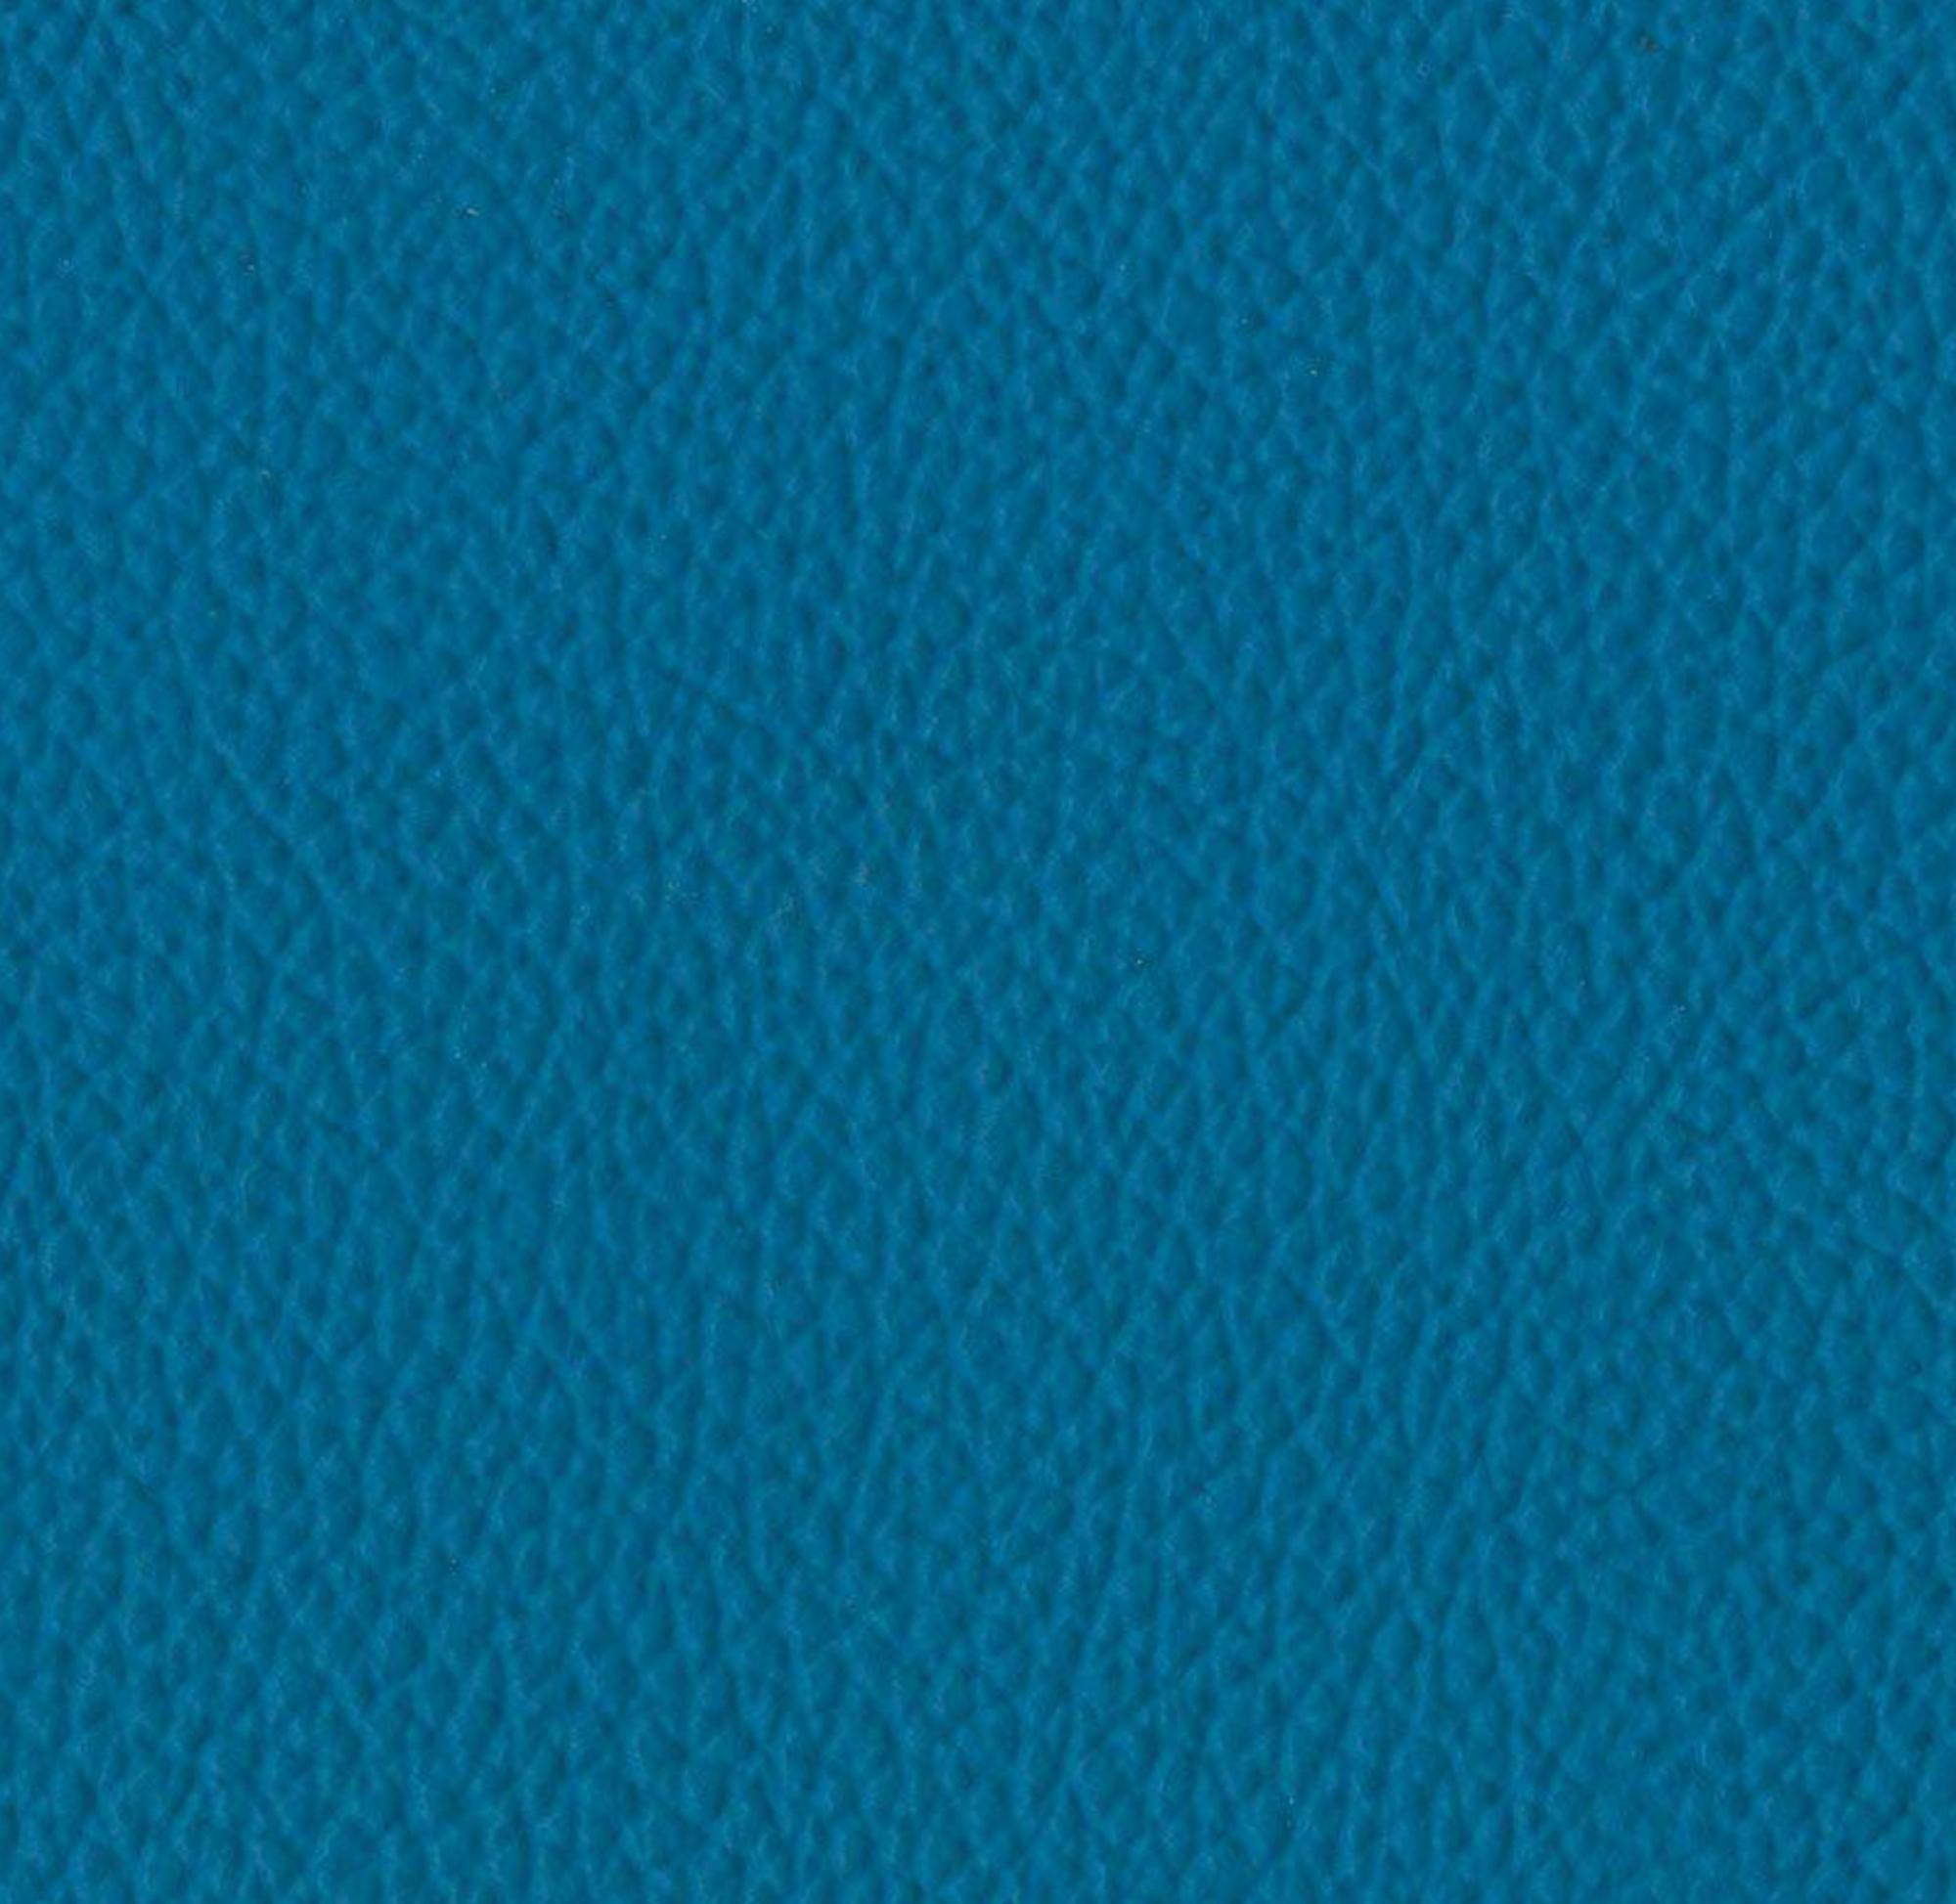 Cyan Blue